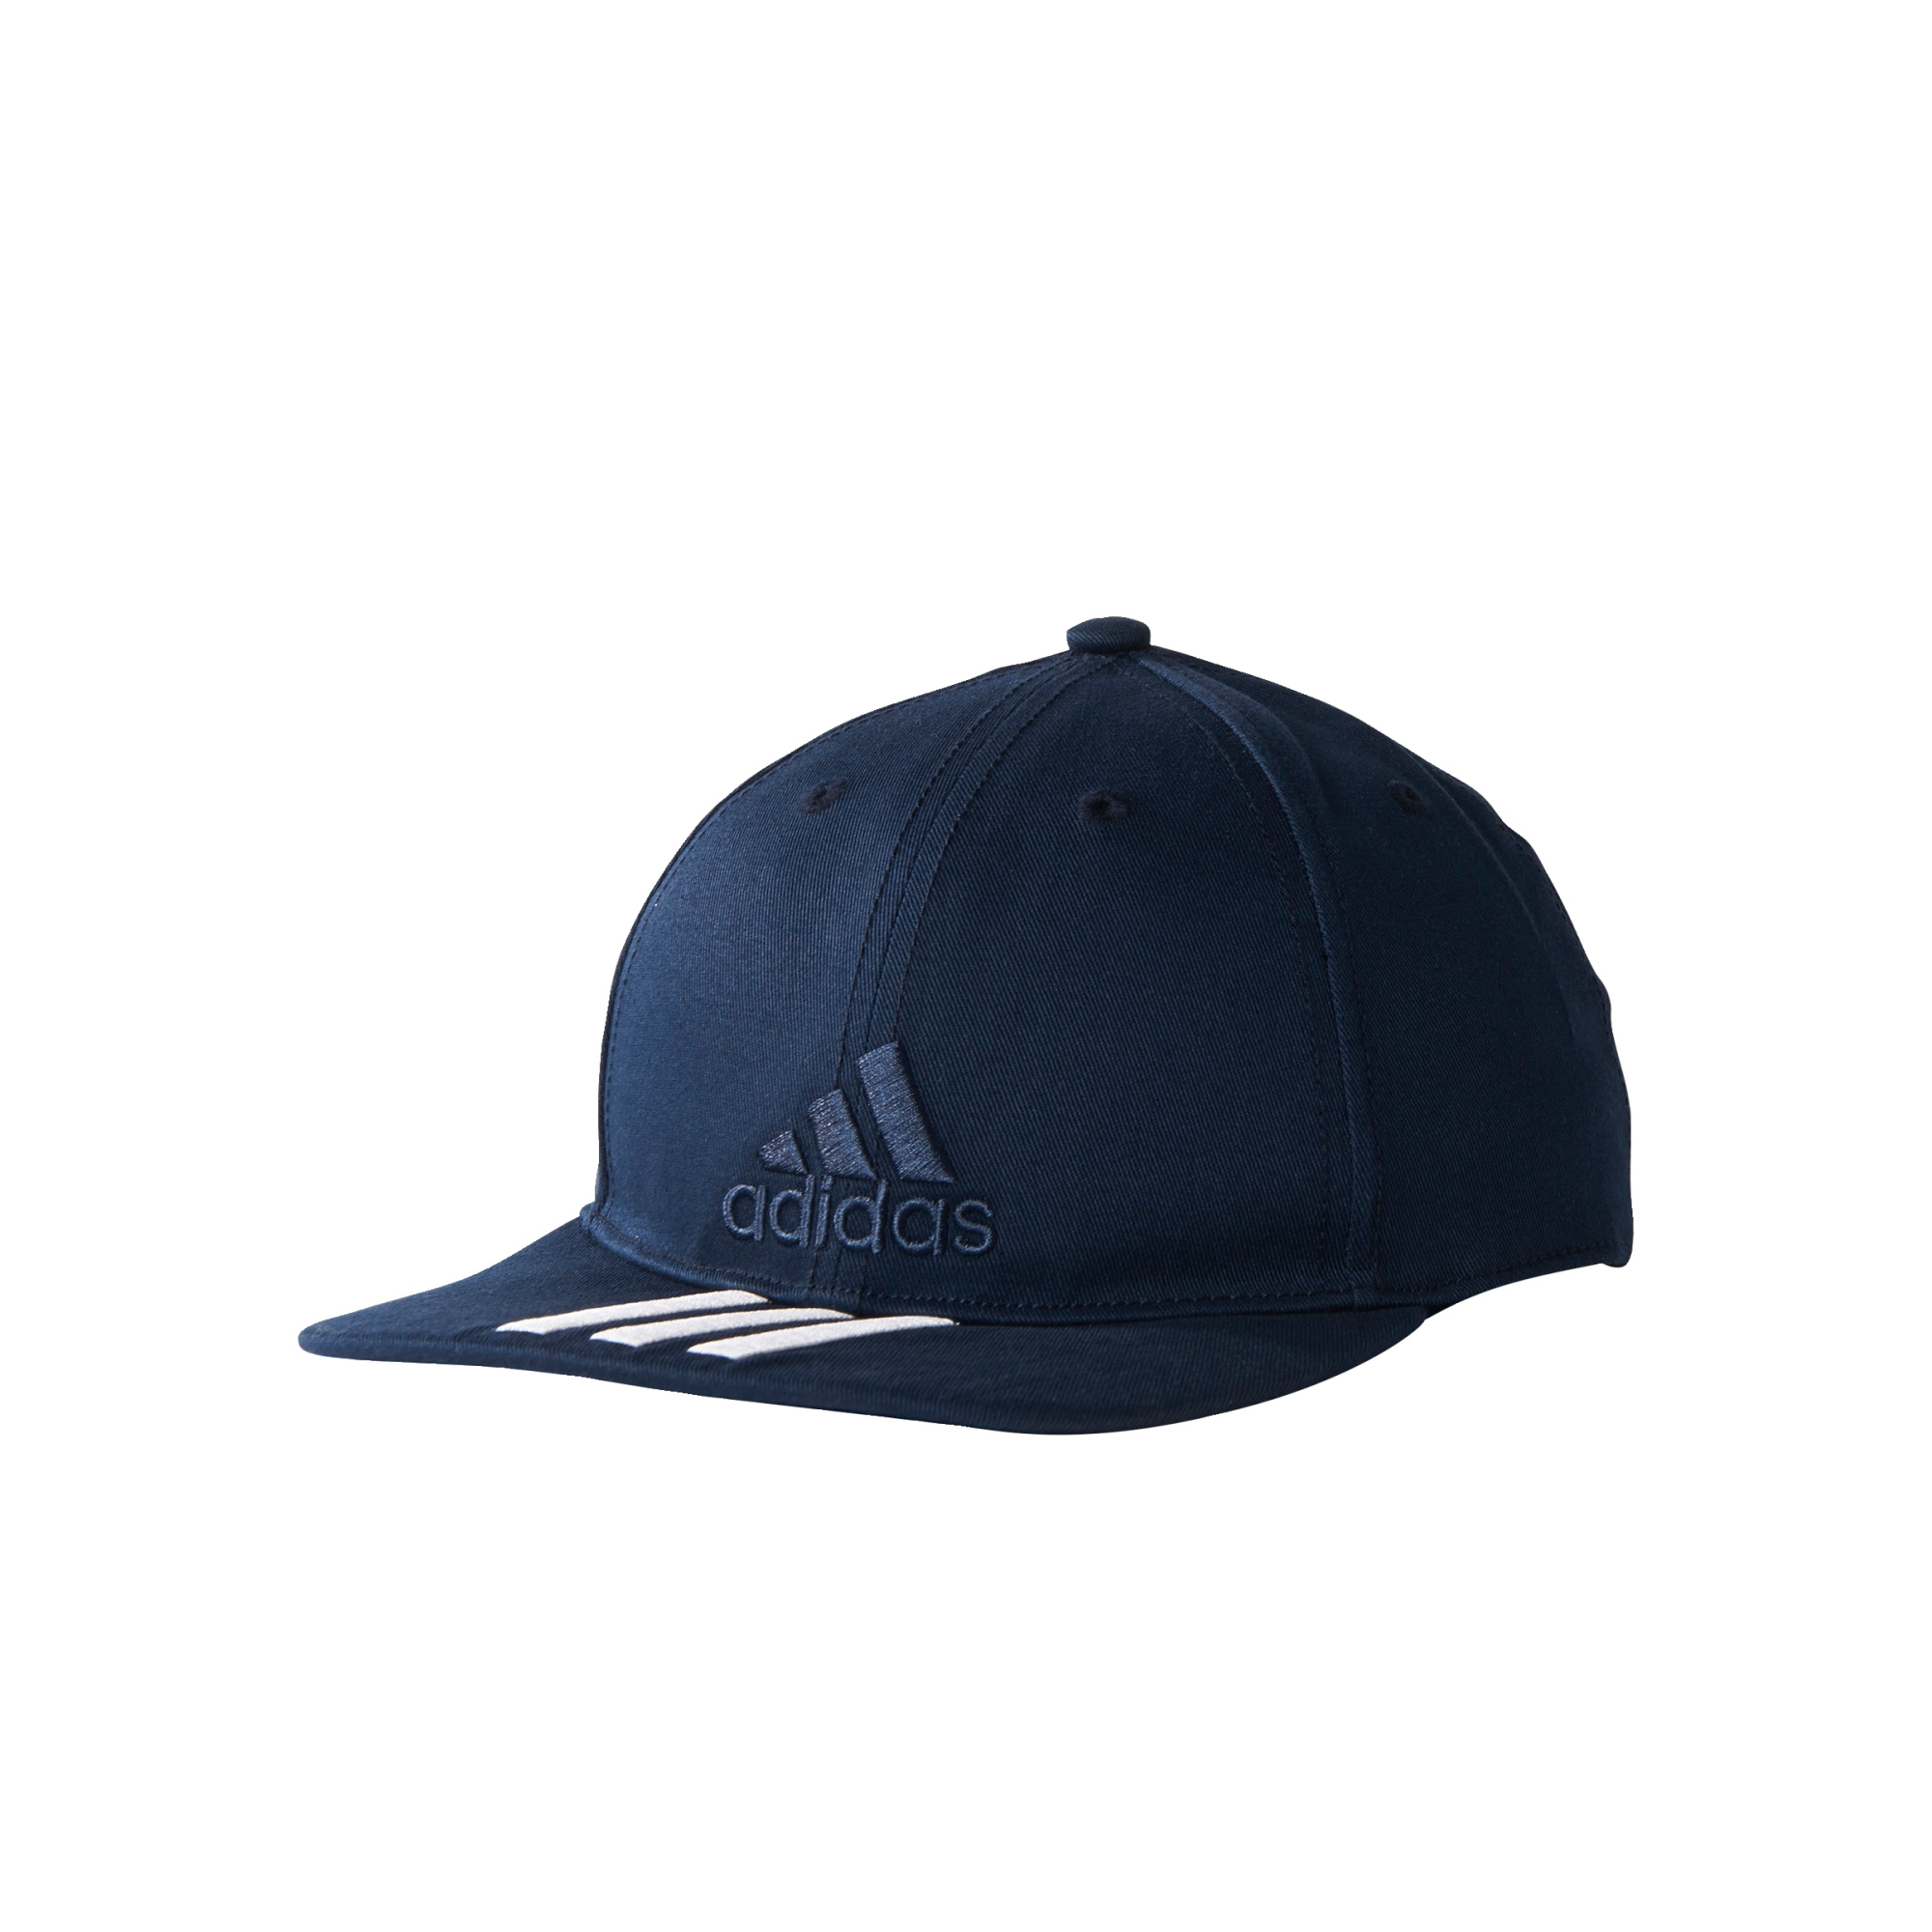 288e1cc2454 Details about adidas Training 3 Stripes Classic Baseball Cap Hat Navy  Blue White - Child